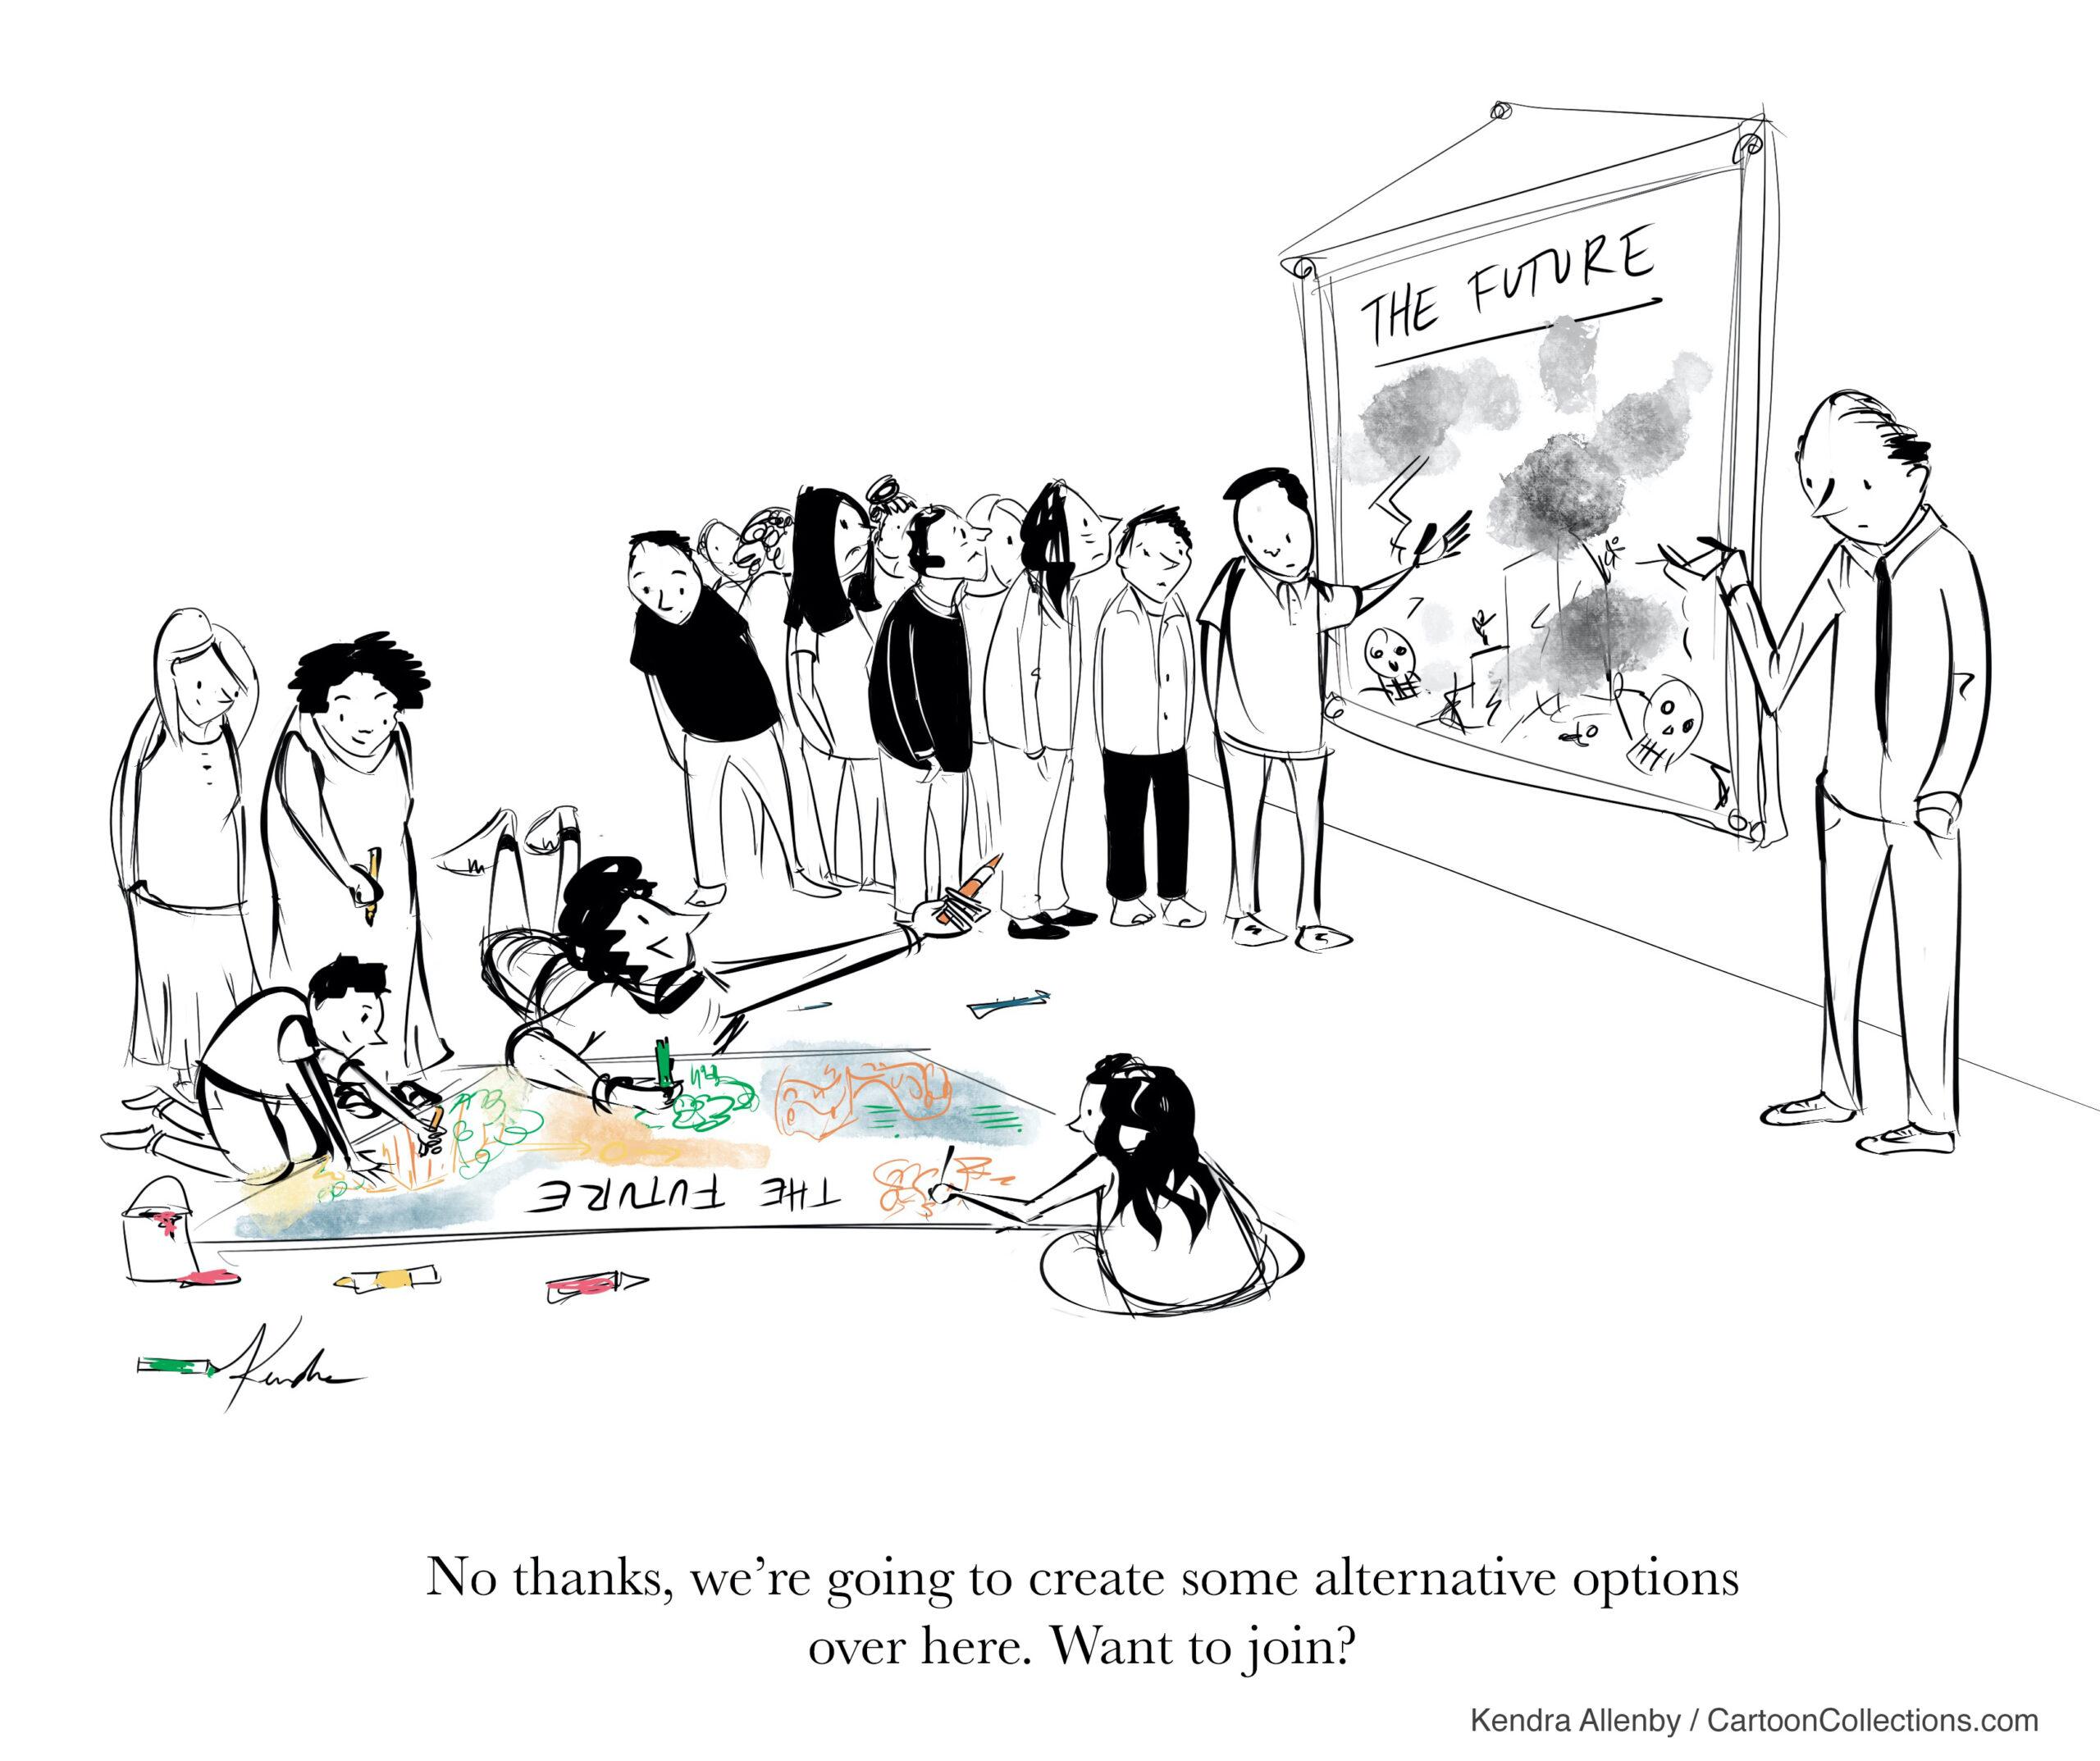 Cartoonathons: stimulating dialogue